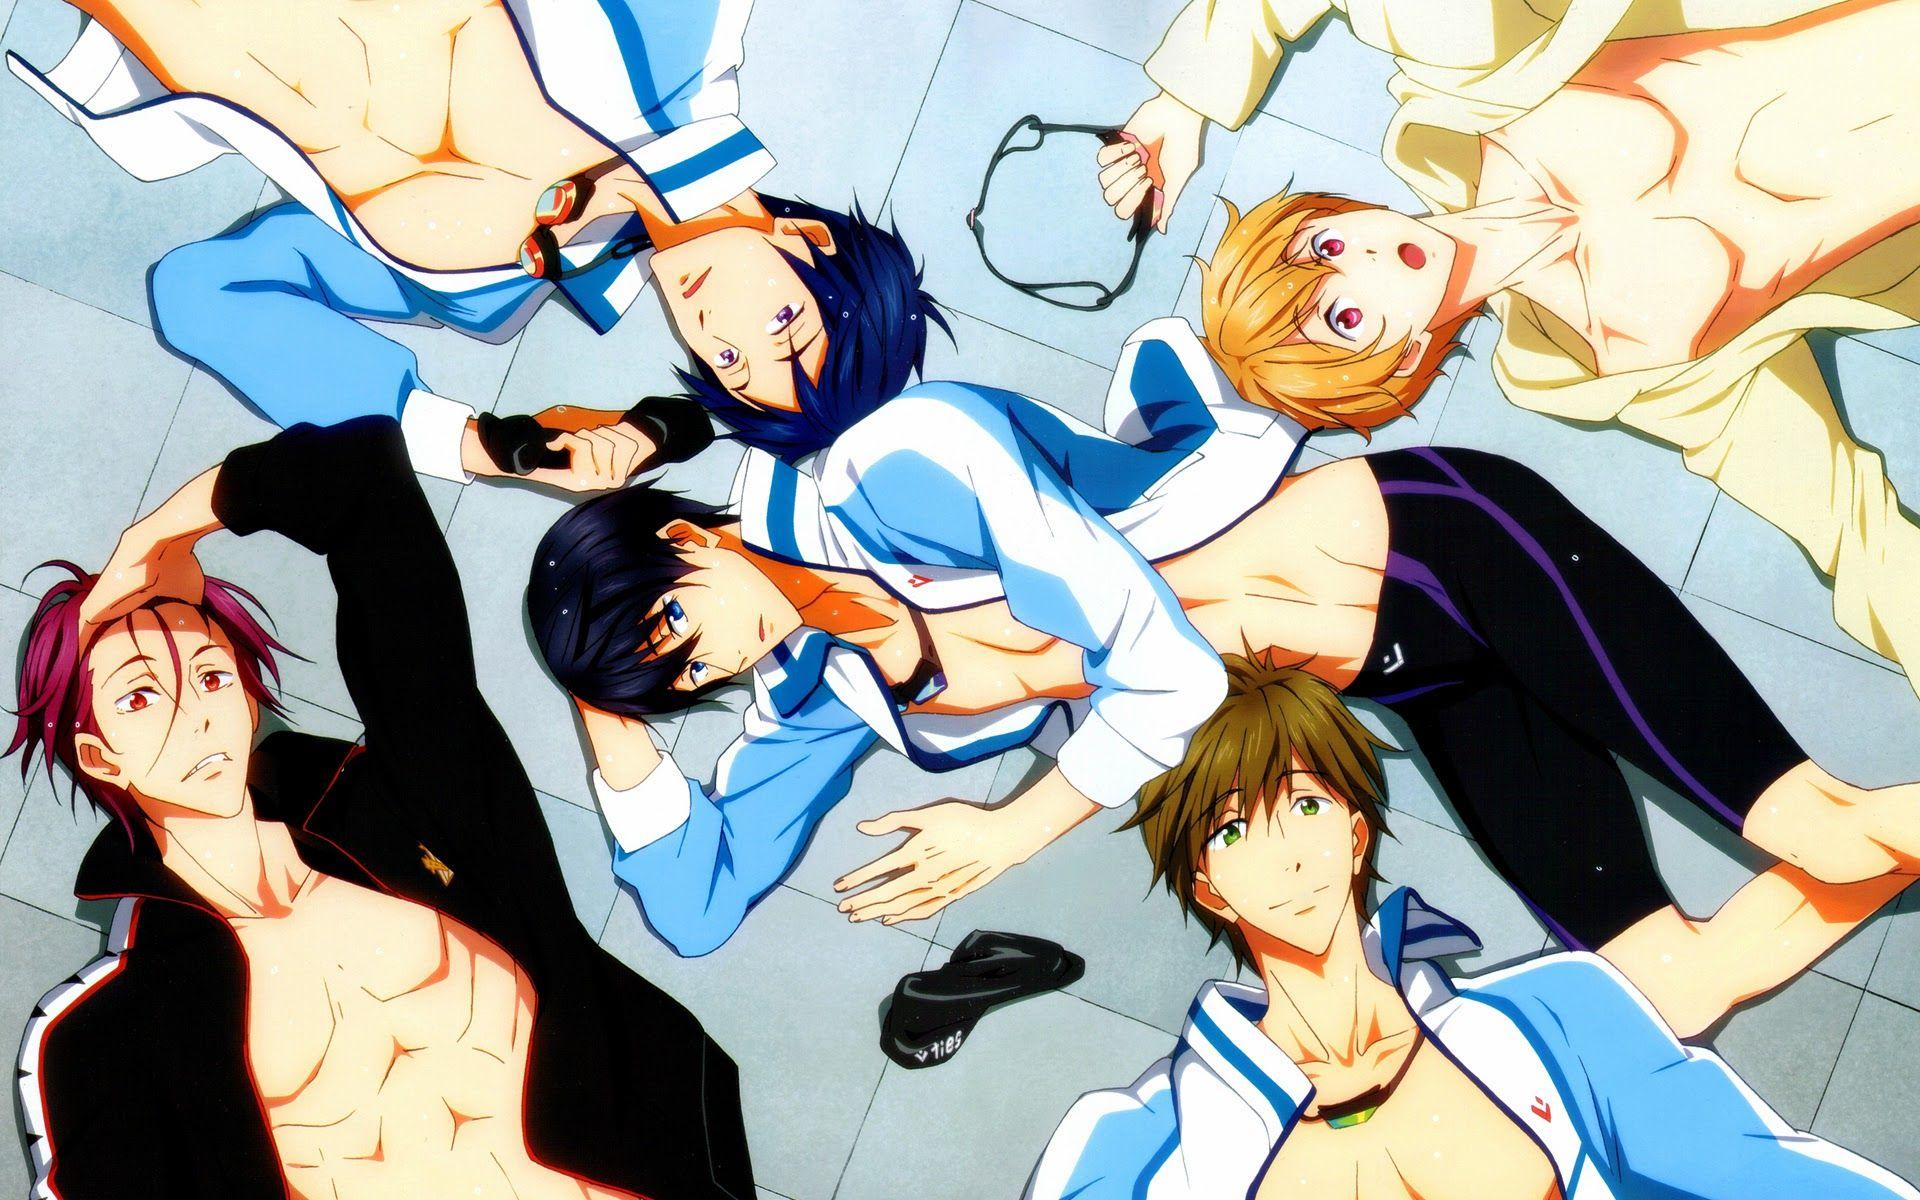 Free Anime Wallpapers 1 Anime Zodiac Free Iwatobi Swim